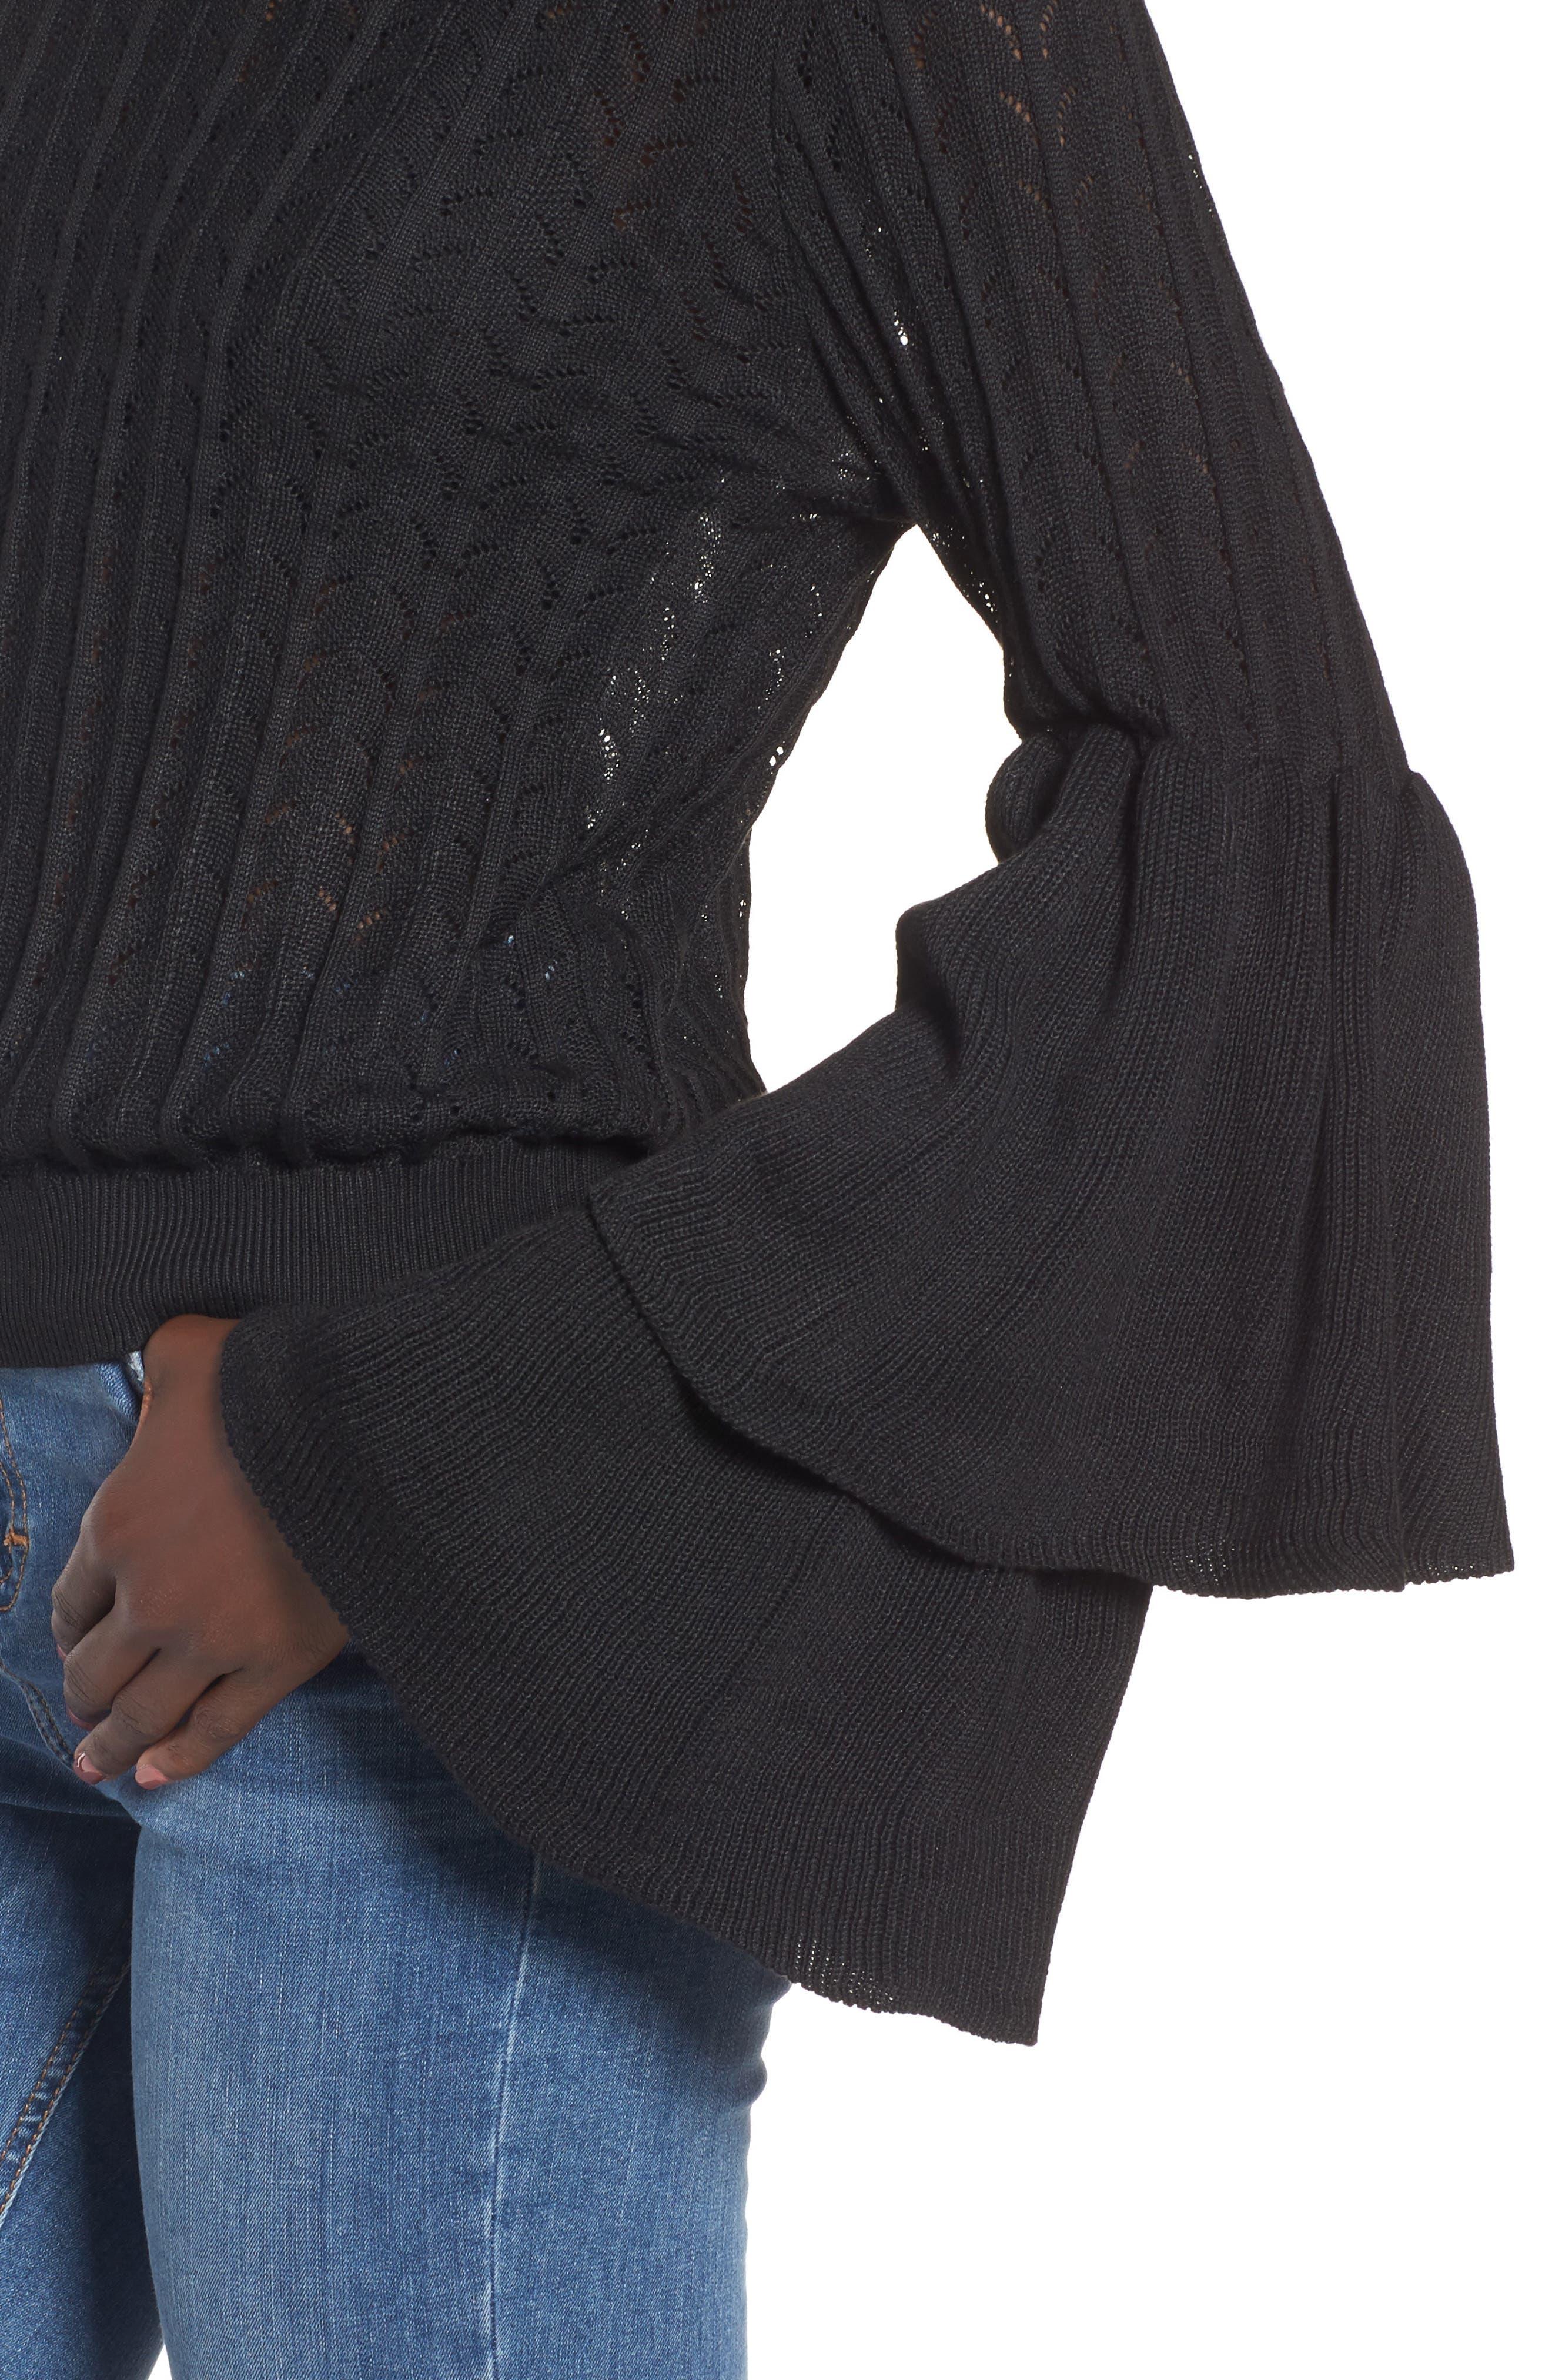 Molly Ruffle Sweater,                             Alternate thumbnail 4, color,                             001